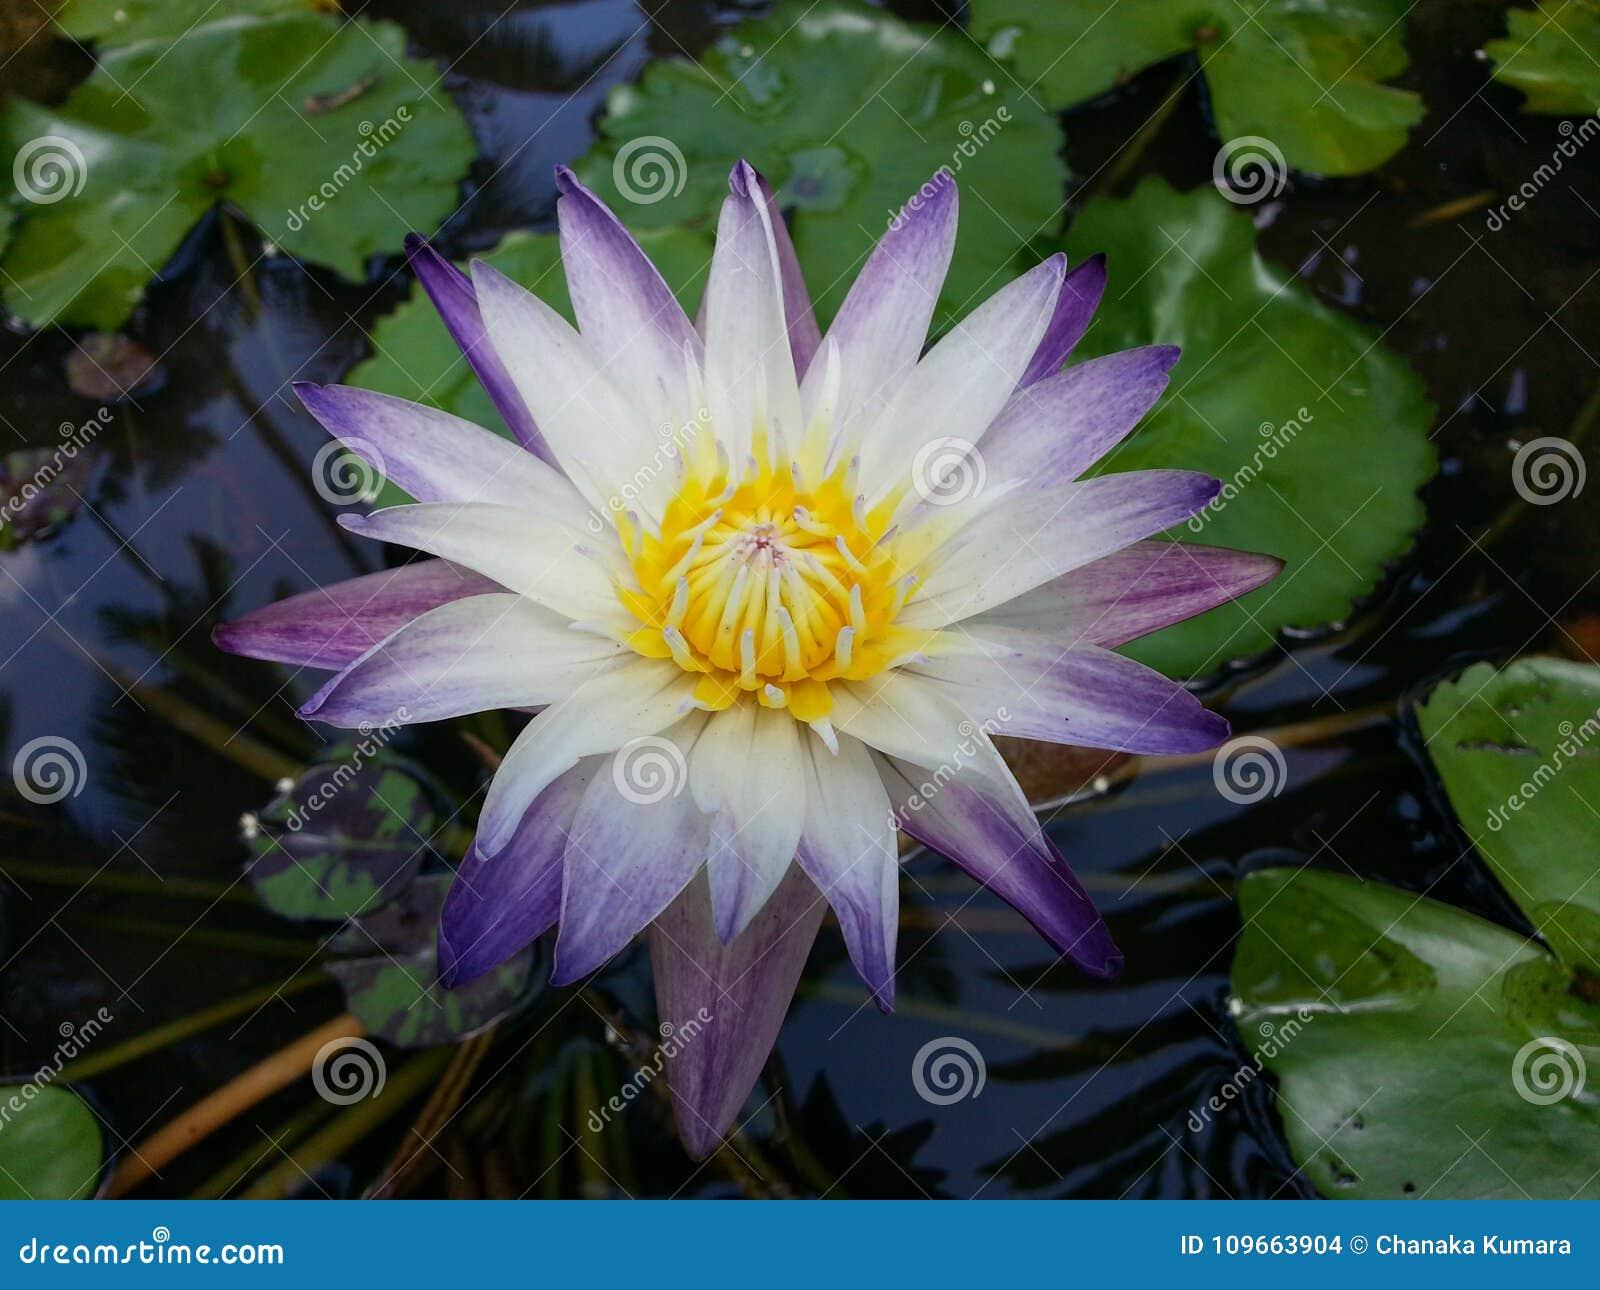 Natural mix white color water lily flower of sri lanka stock photo royalty free stock photo izmirmasajfo